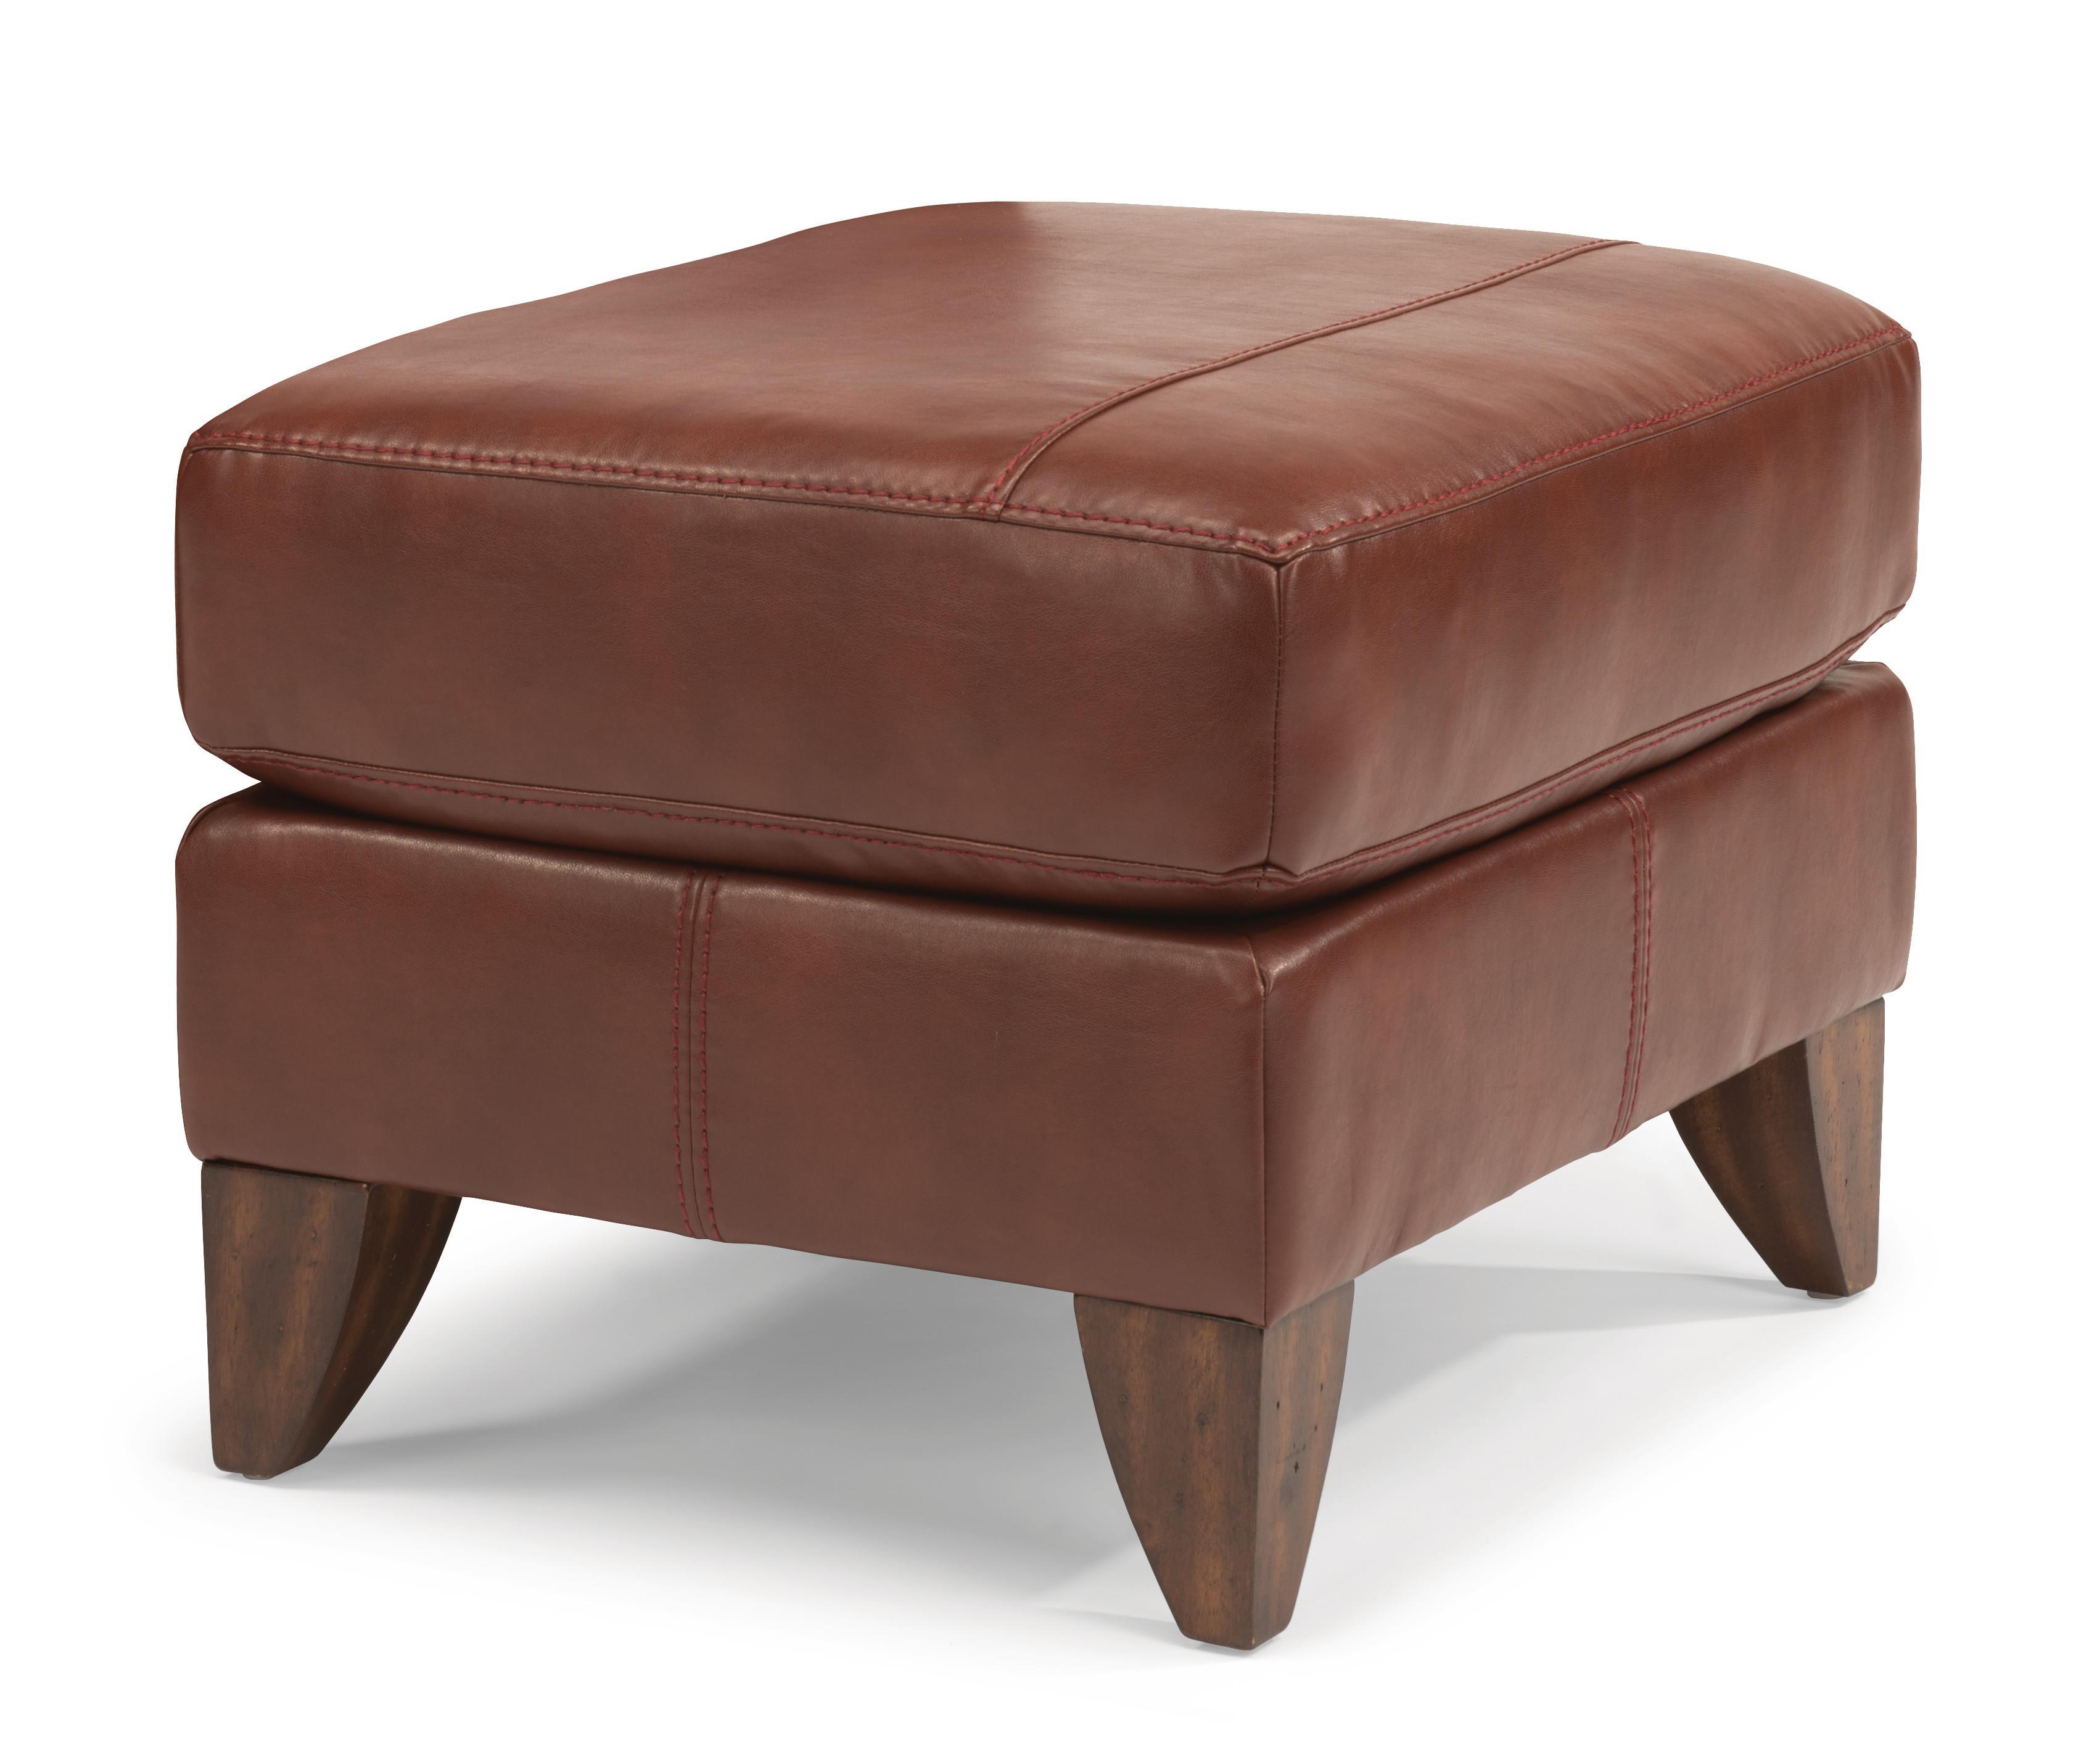 best chairs geneva glider weight limit stool chair with storage flexsteel accents jupiter upholstered ottoman olinde 39s